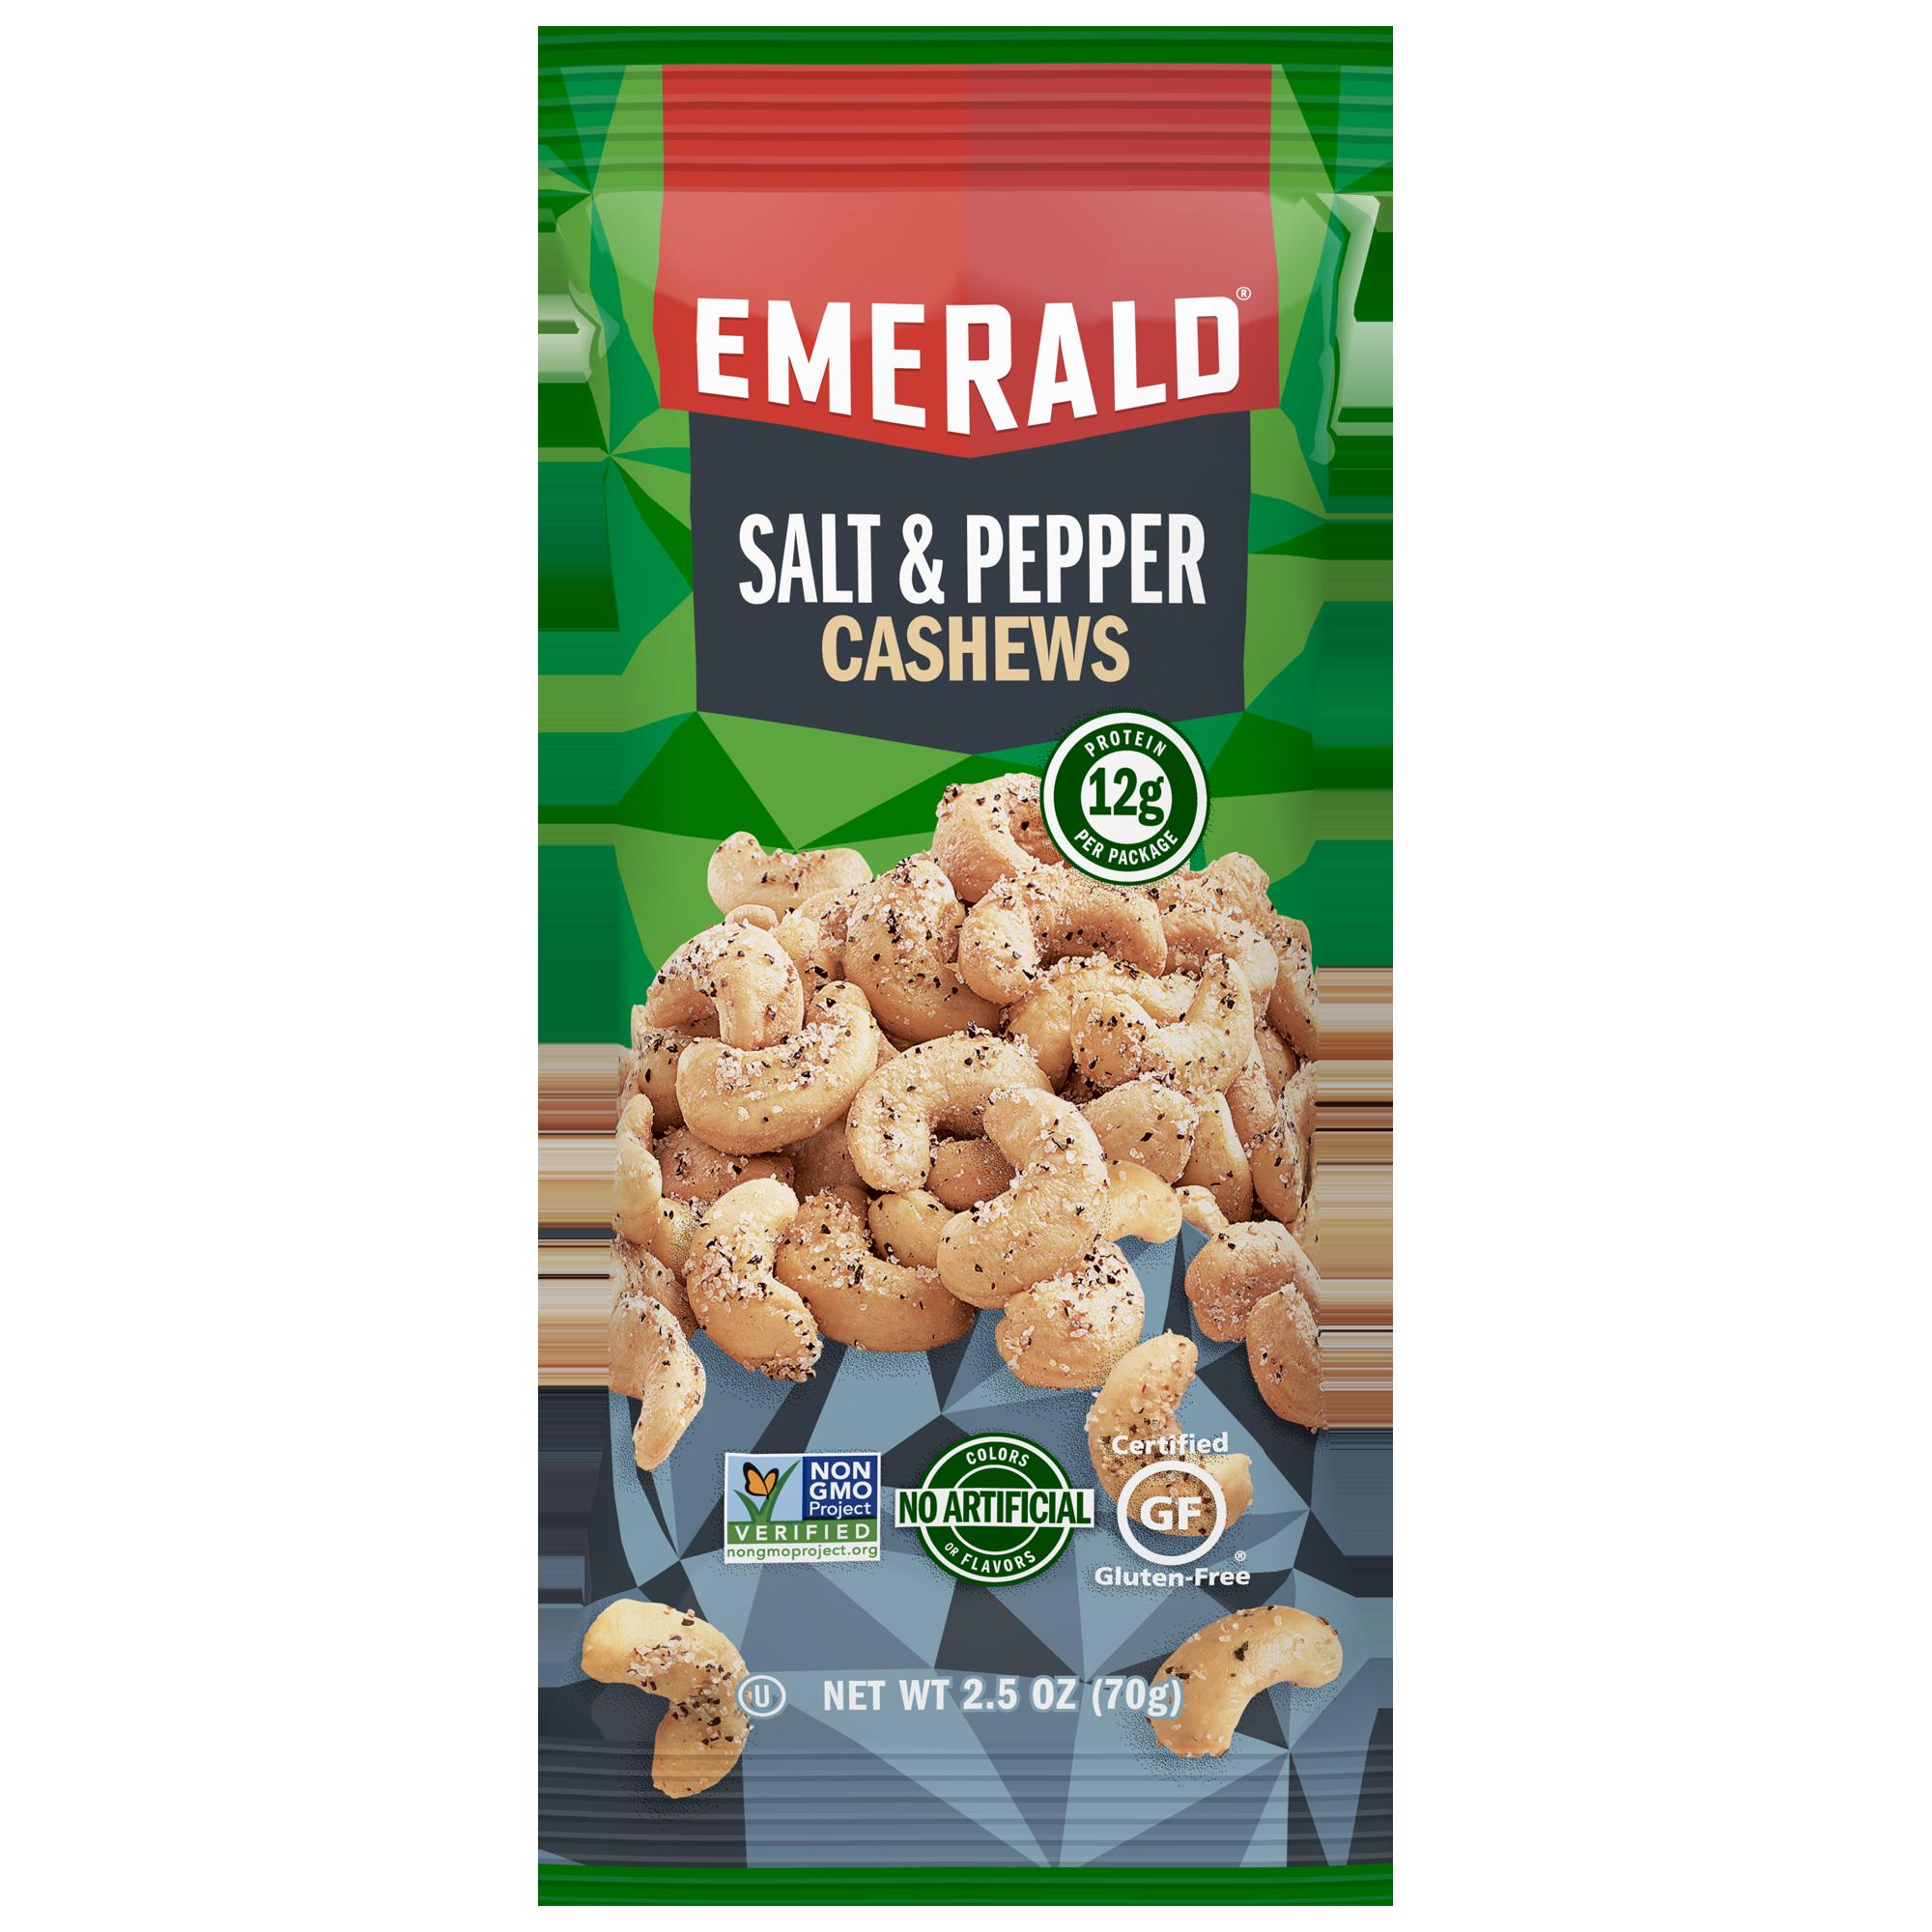 Emerald Nuts, Salt & Pepper Cashews, 2.5 Oz